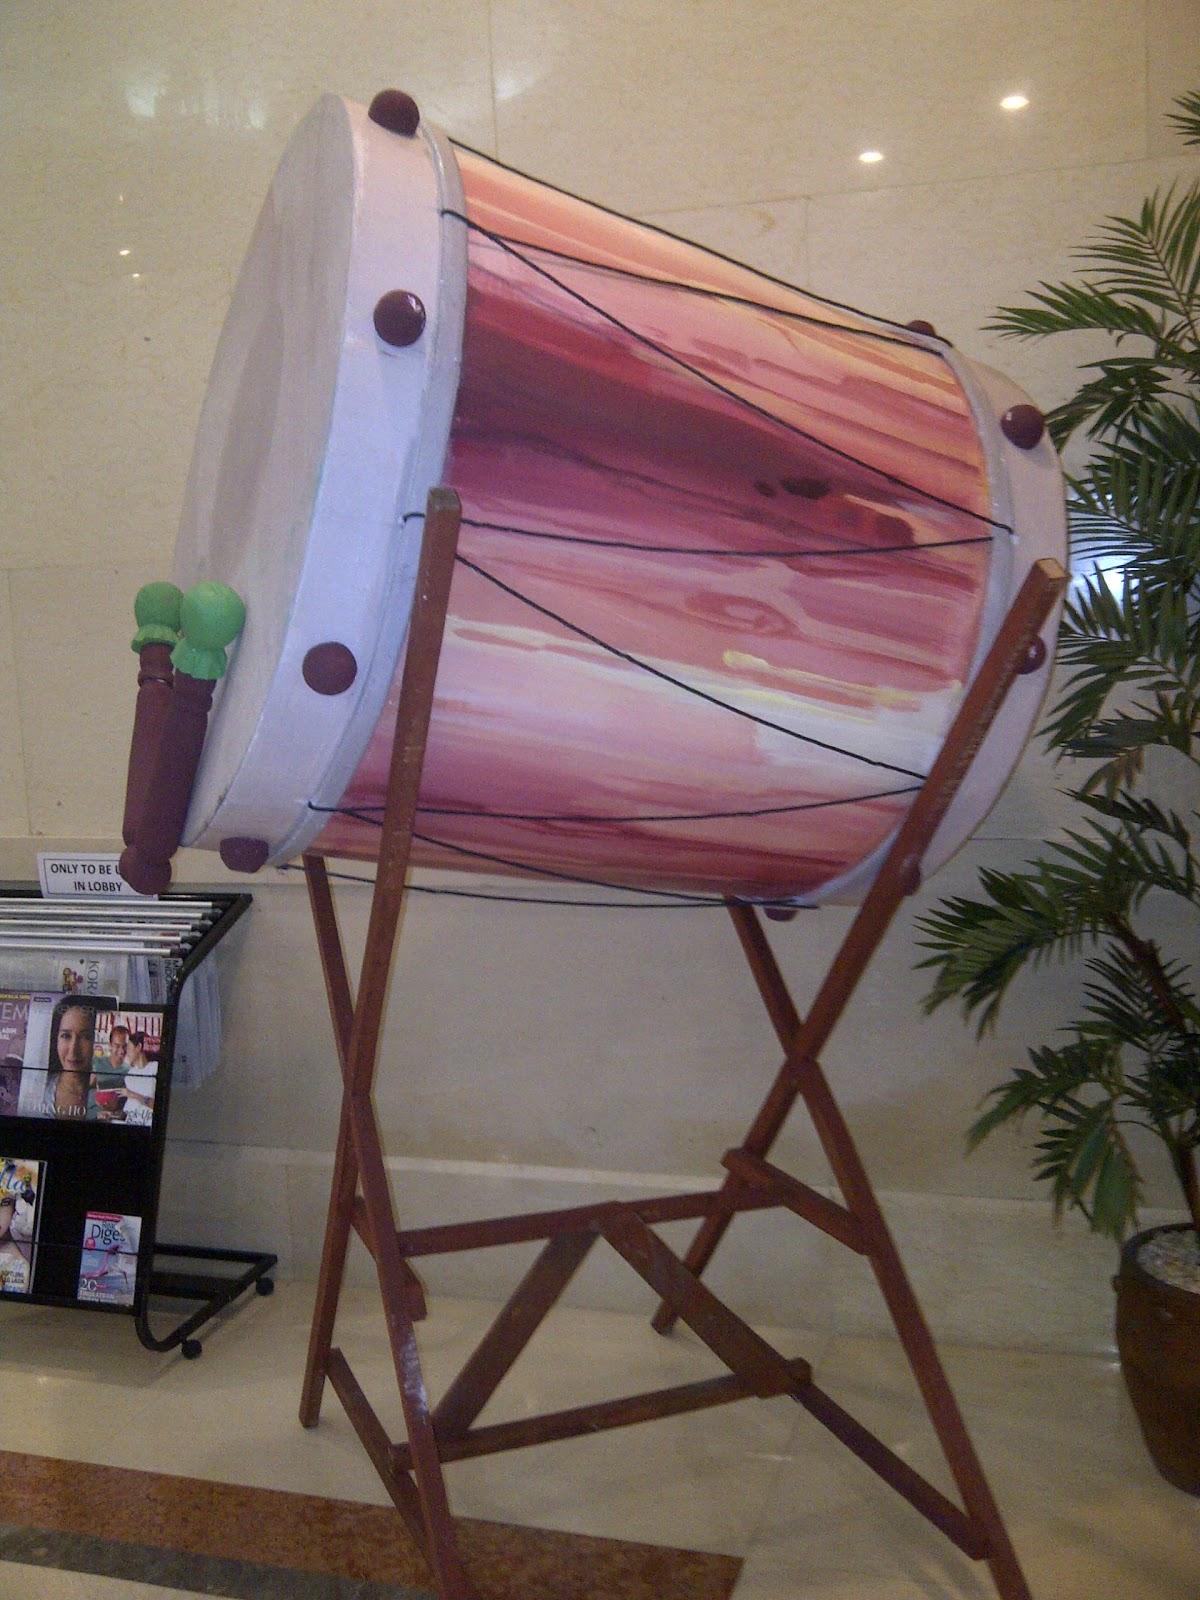 Dekorasi styrofoam bedug 3d for Dekorasi lebaran hotel